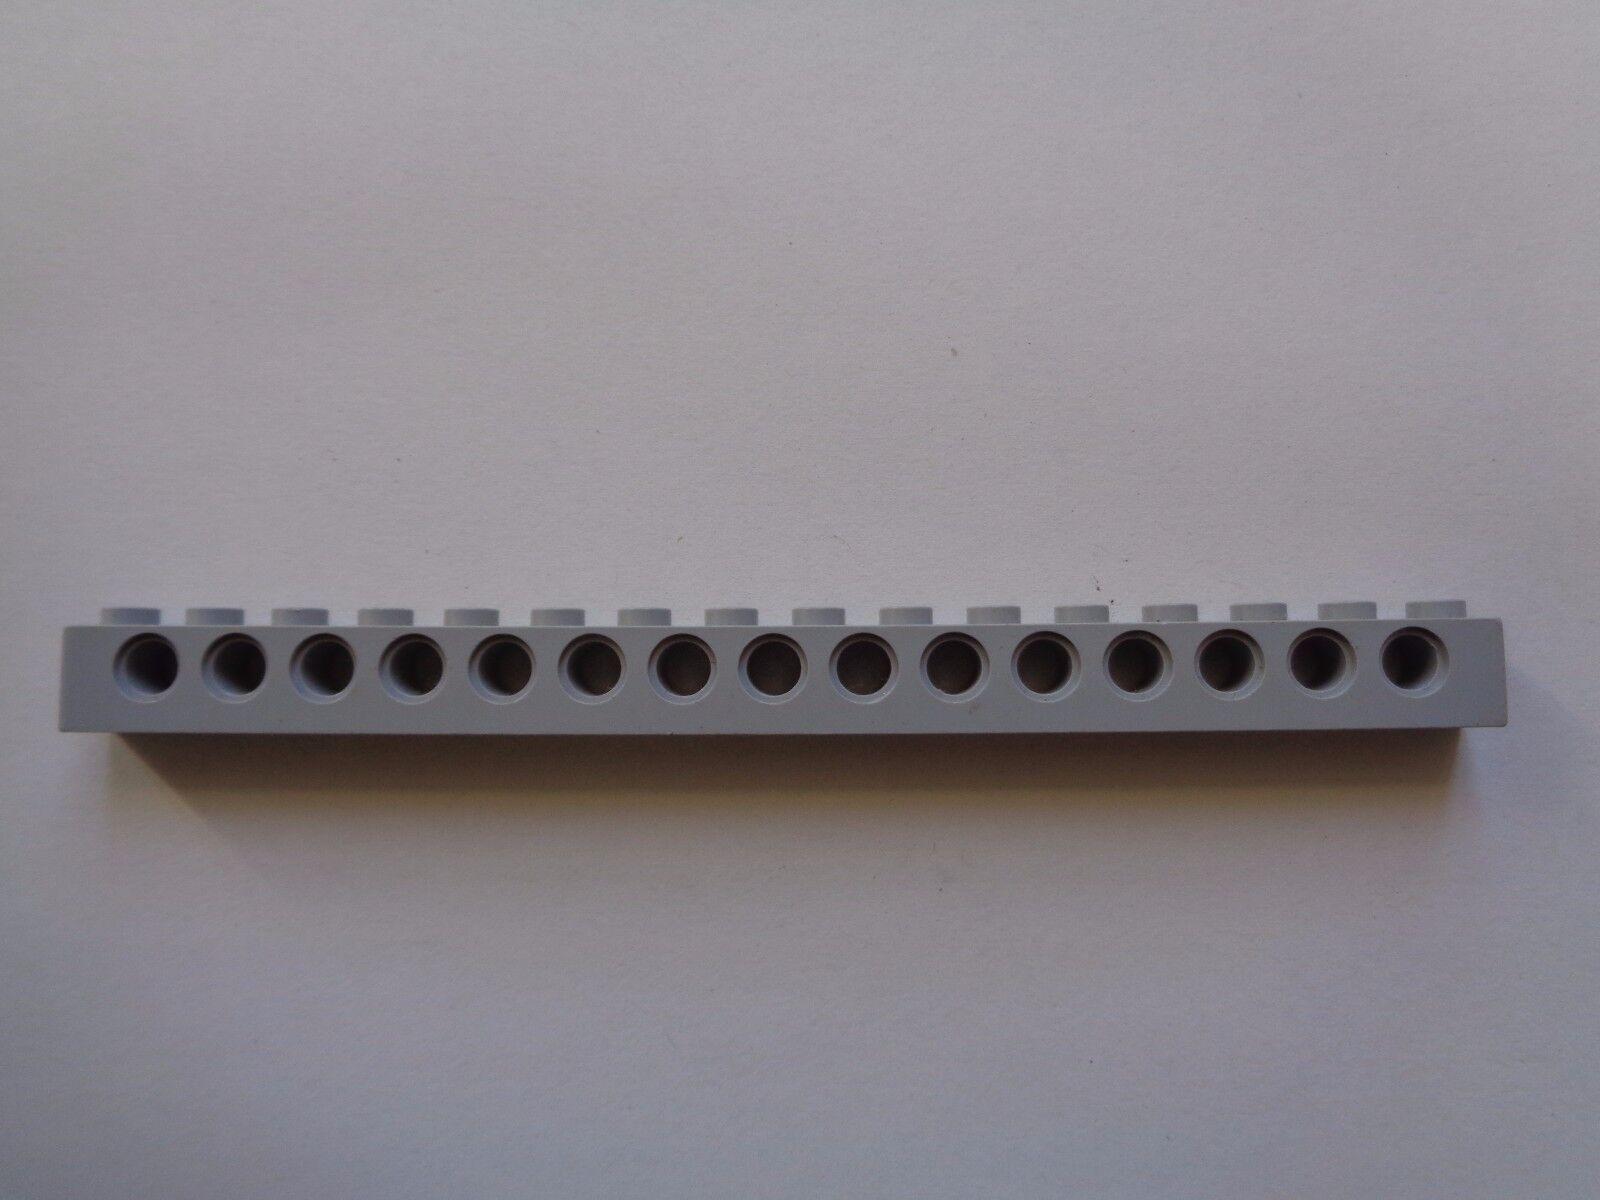 Uxcell a15120300ux0073 5//32inch-32x1//4inch Button Head Hex Socket Cap Screw Bolt